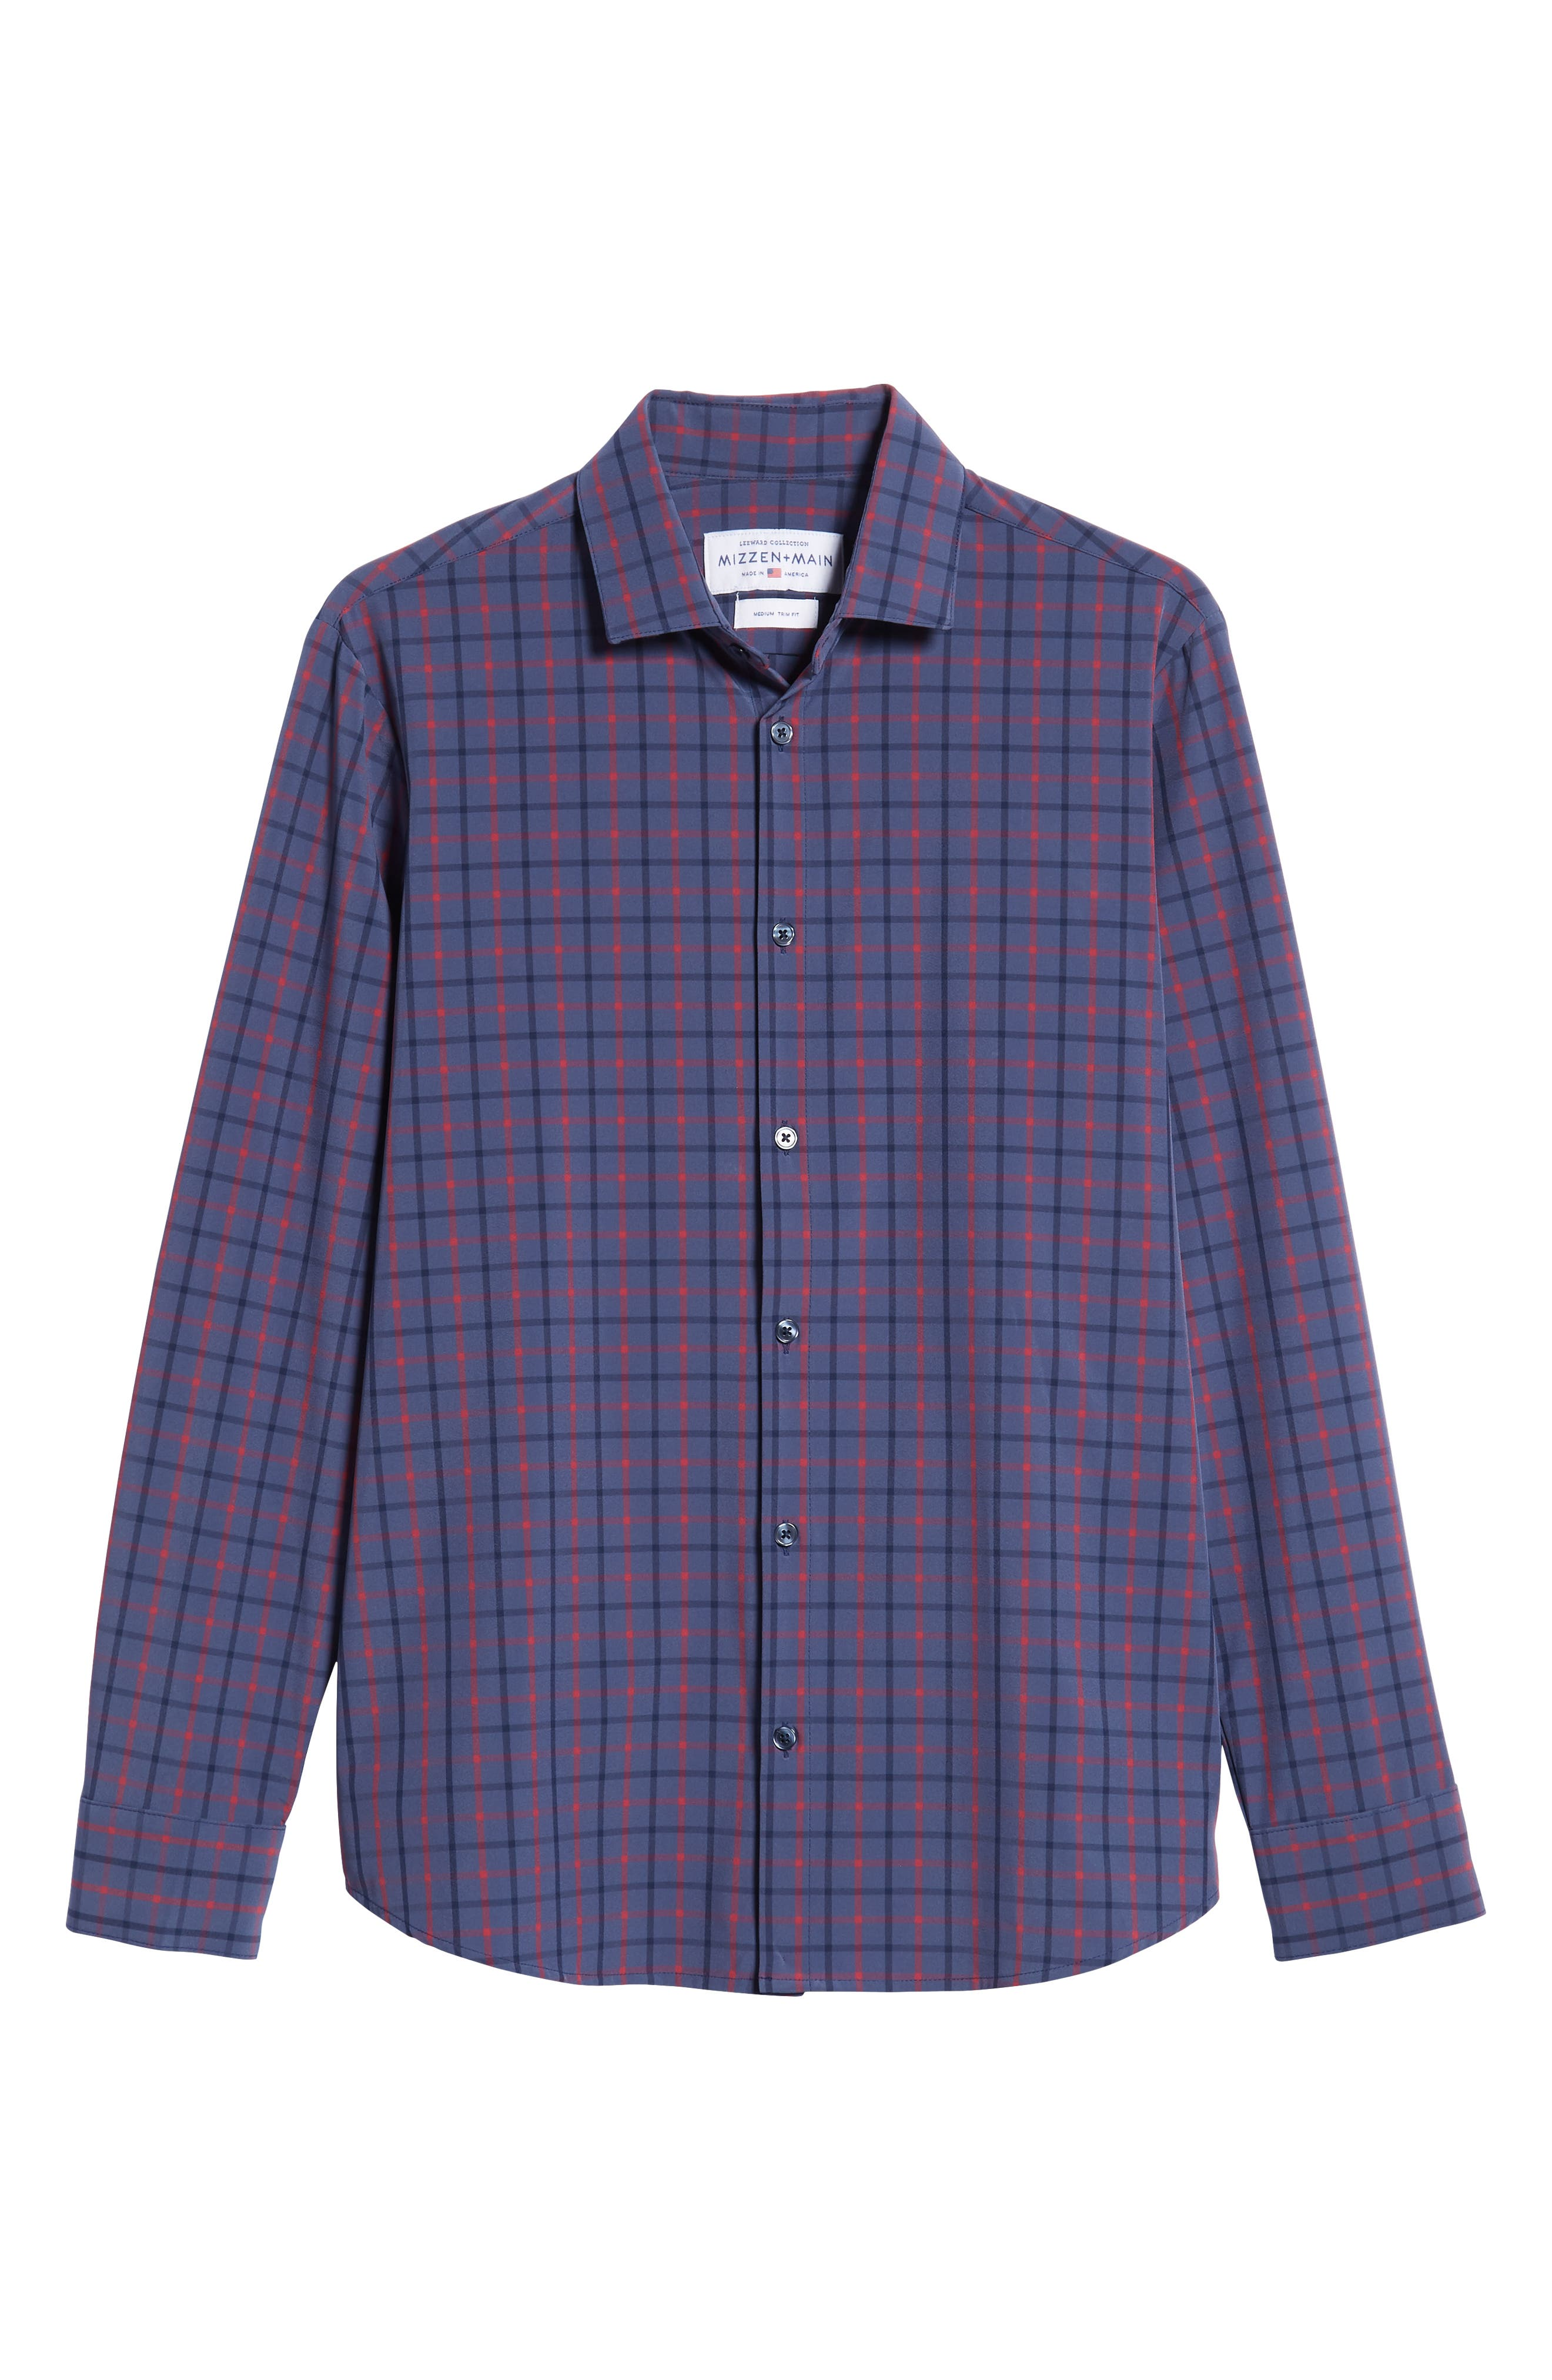 Wilson Slim Fit Plaid Performance Sport Shirt,                             Alternate thumbnail 5, color,                             BLUE